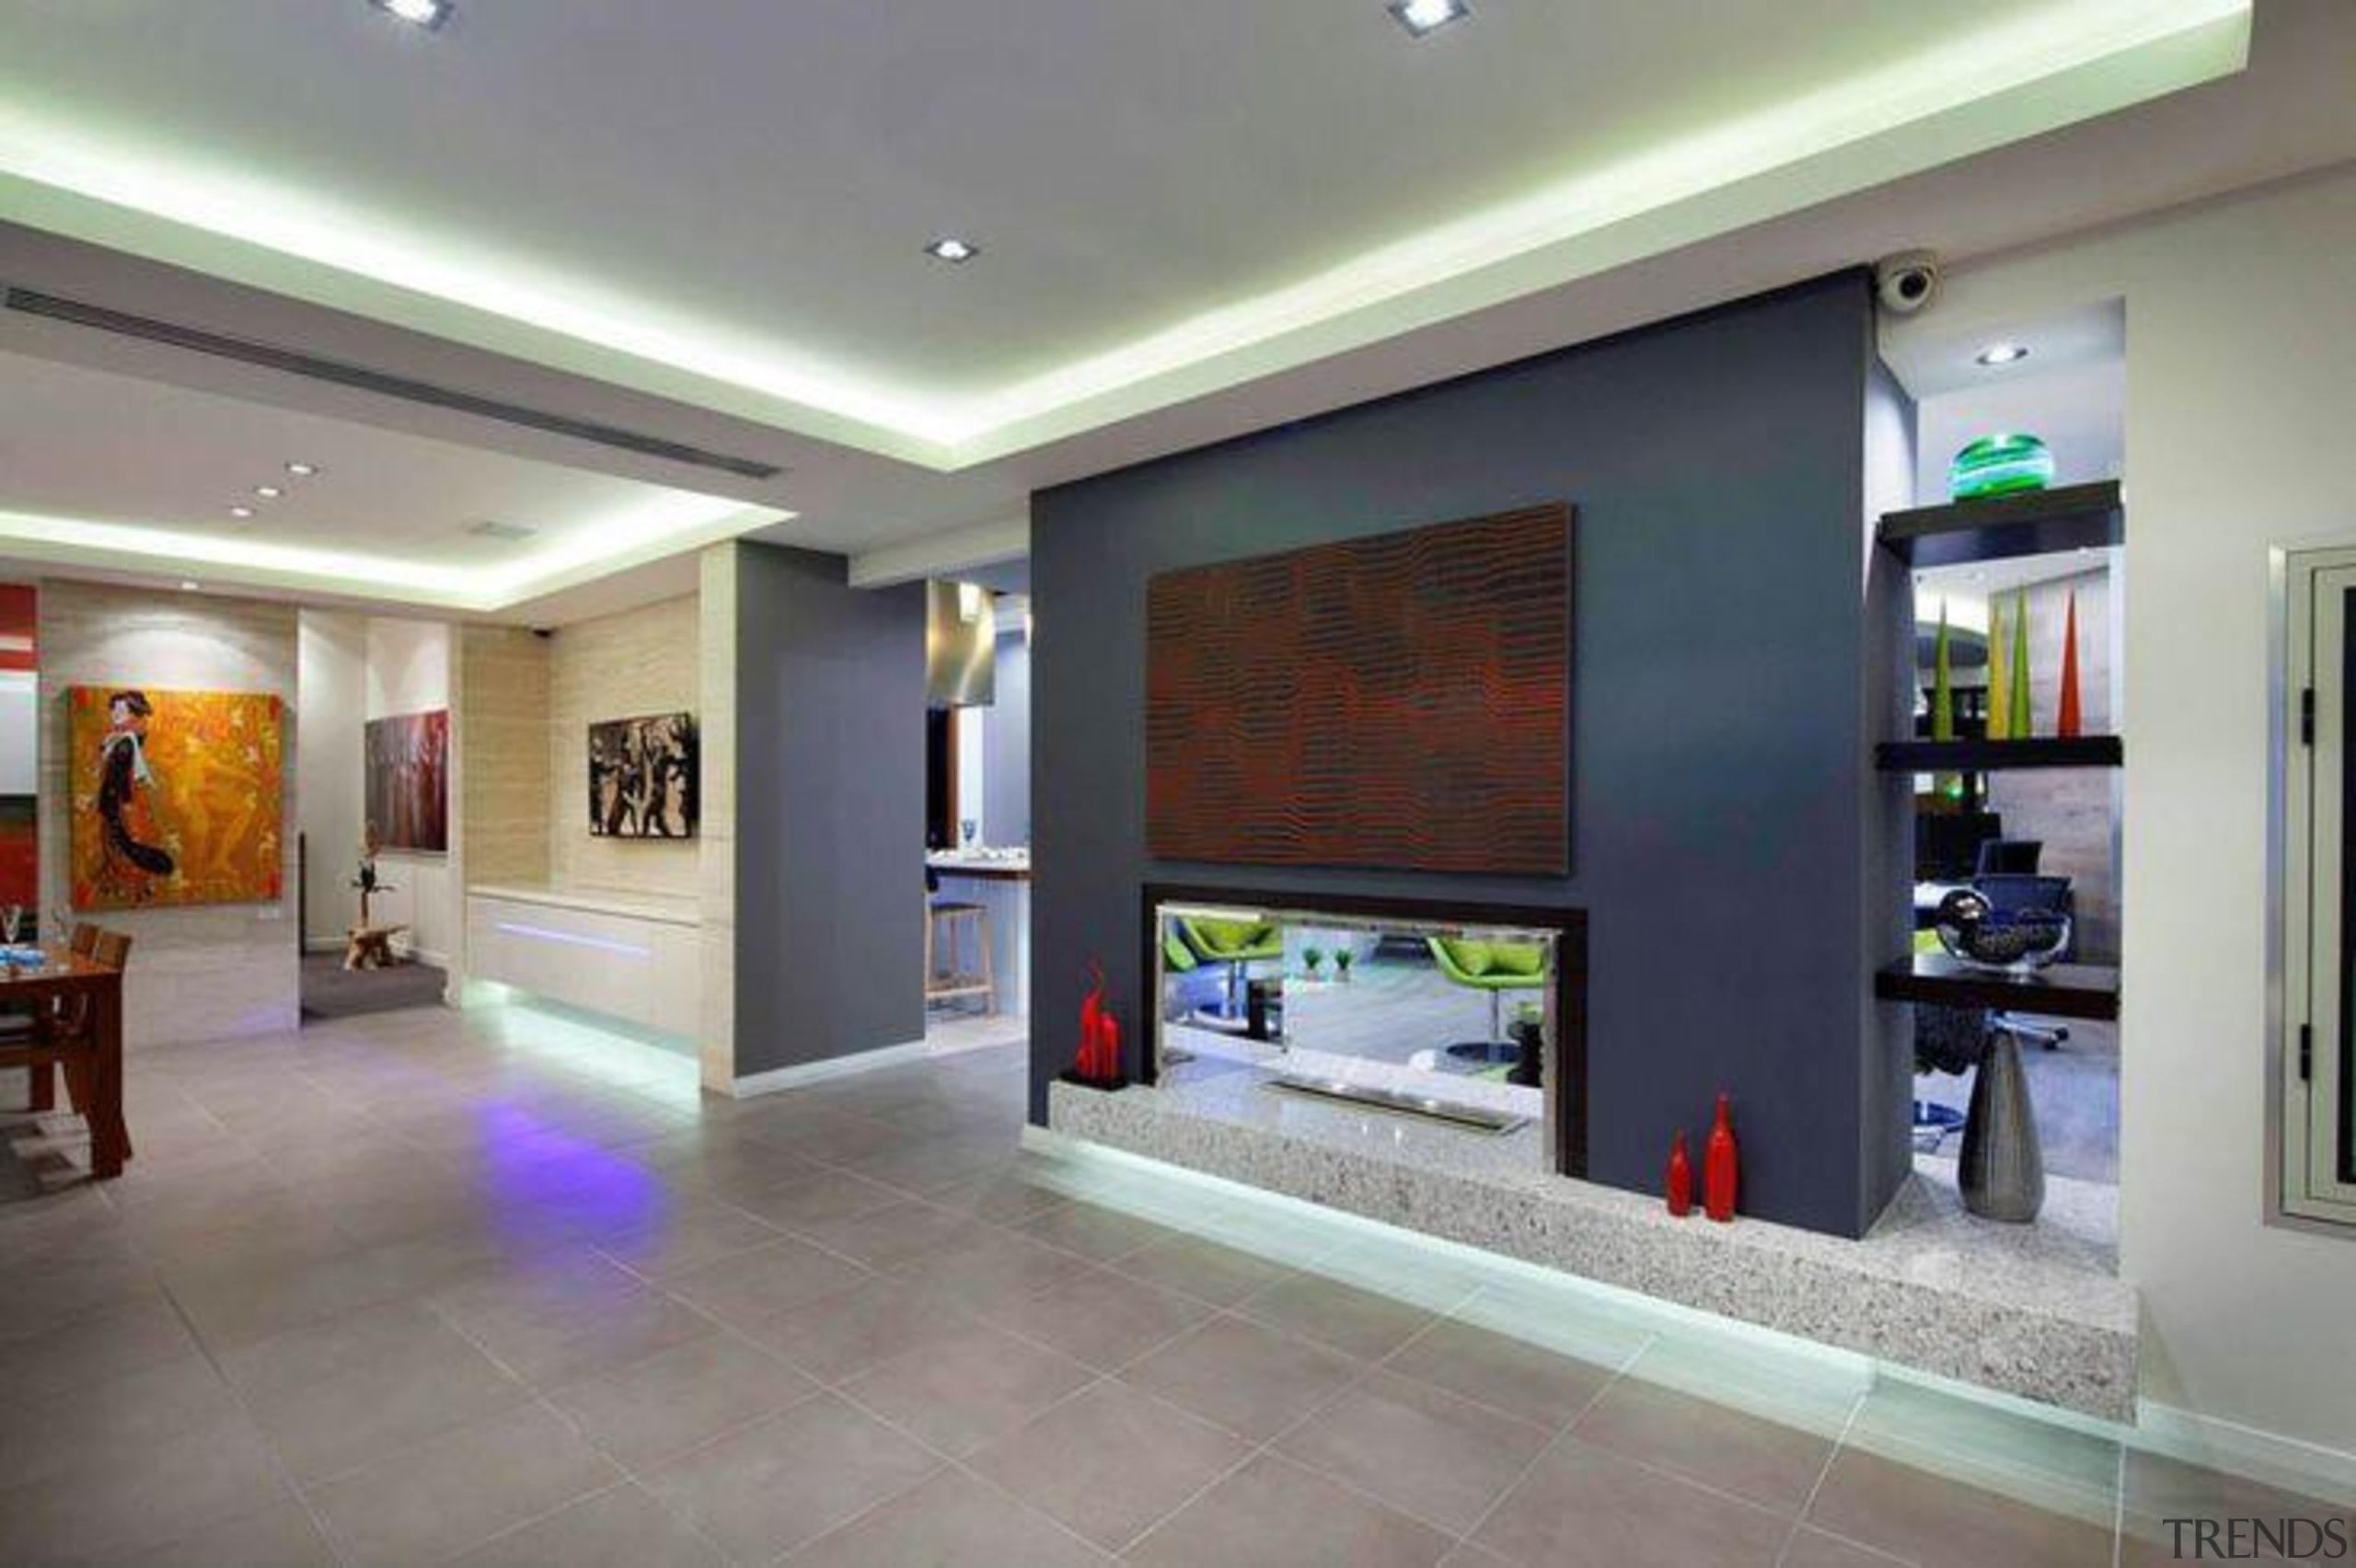 6d5aa271e5da9fd6fc2163da7993a0b8.jpg - 6d5aa271e5da9fd6fc2163da7993a0b8.jpg - ceiling | floor | ceiling, floor, flooring, interior design, lobby, real estate, gray